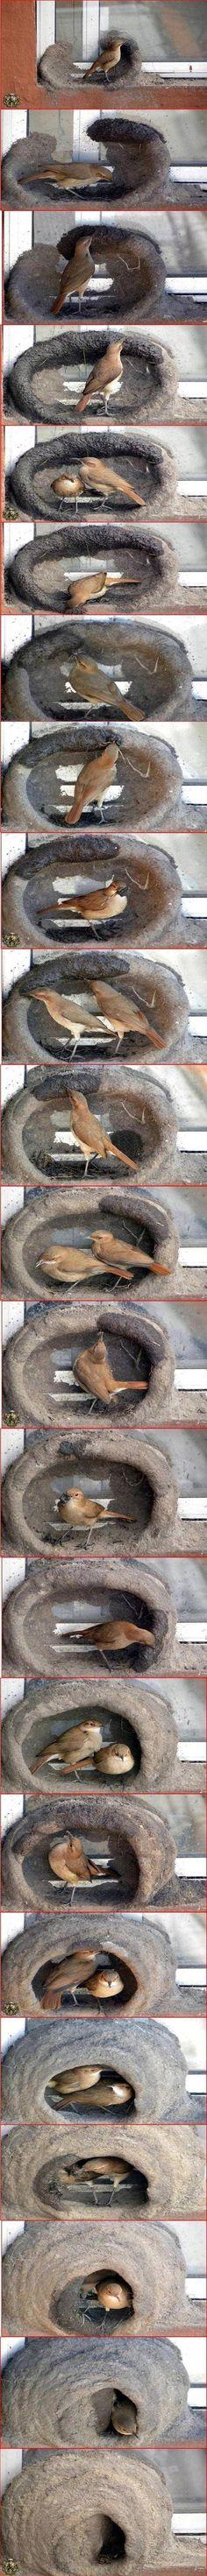 Red Oven birds building nest - amazing!